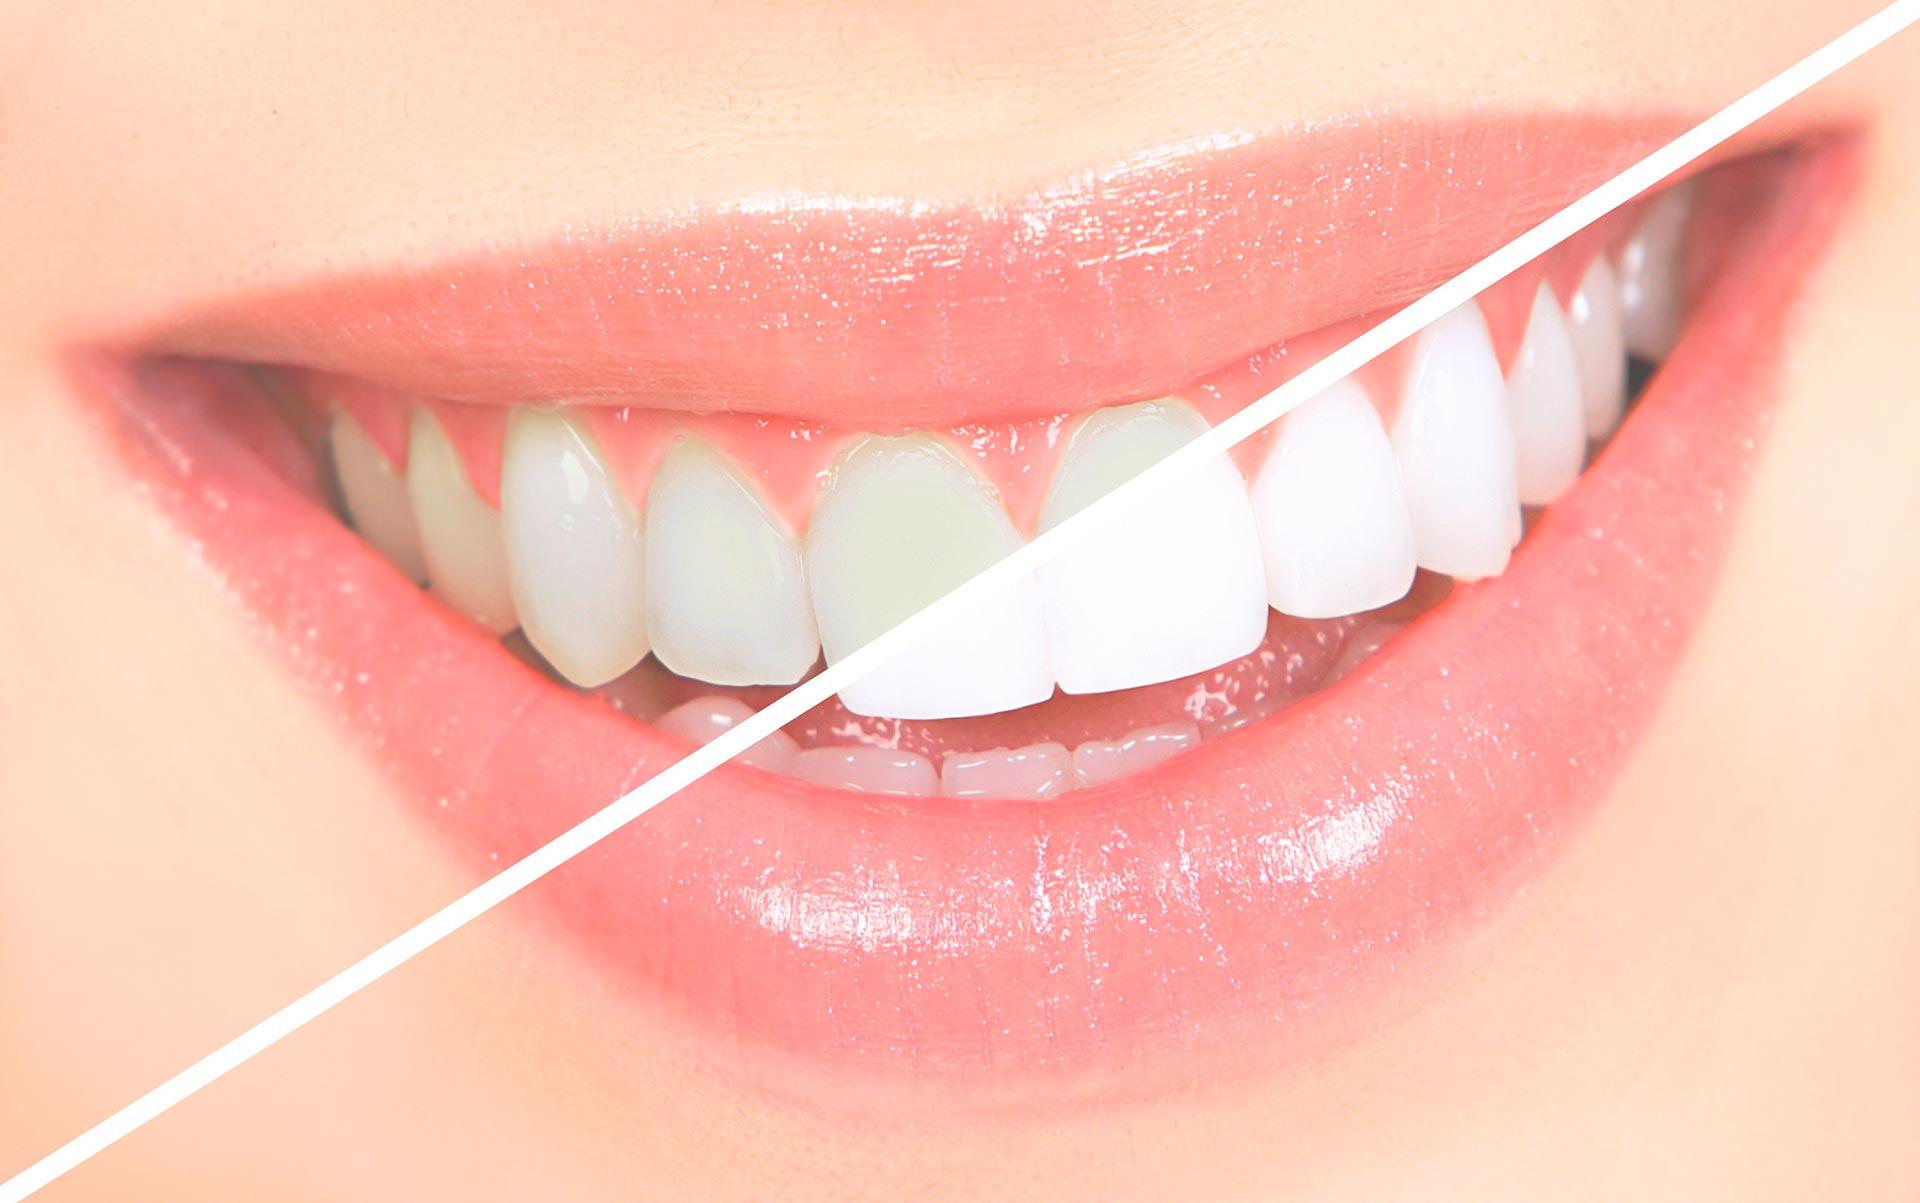 O Acafrao Clareia Os Dentes Mito Ou Verdade